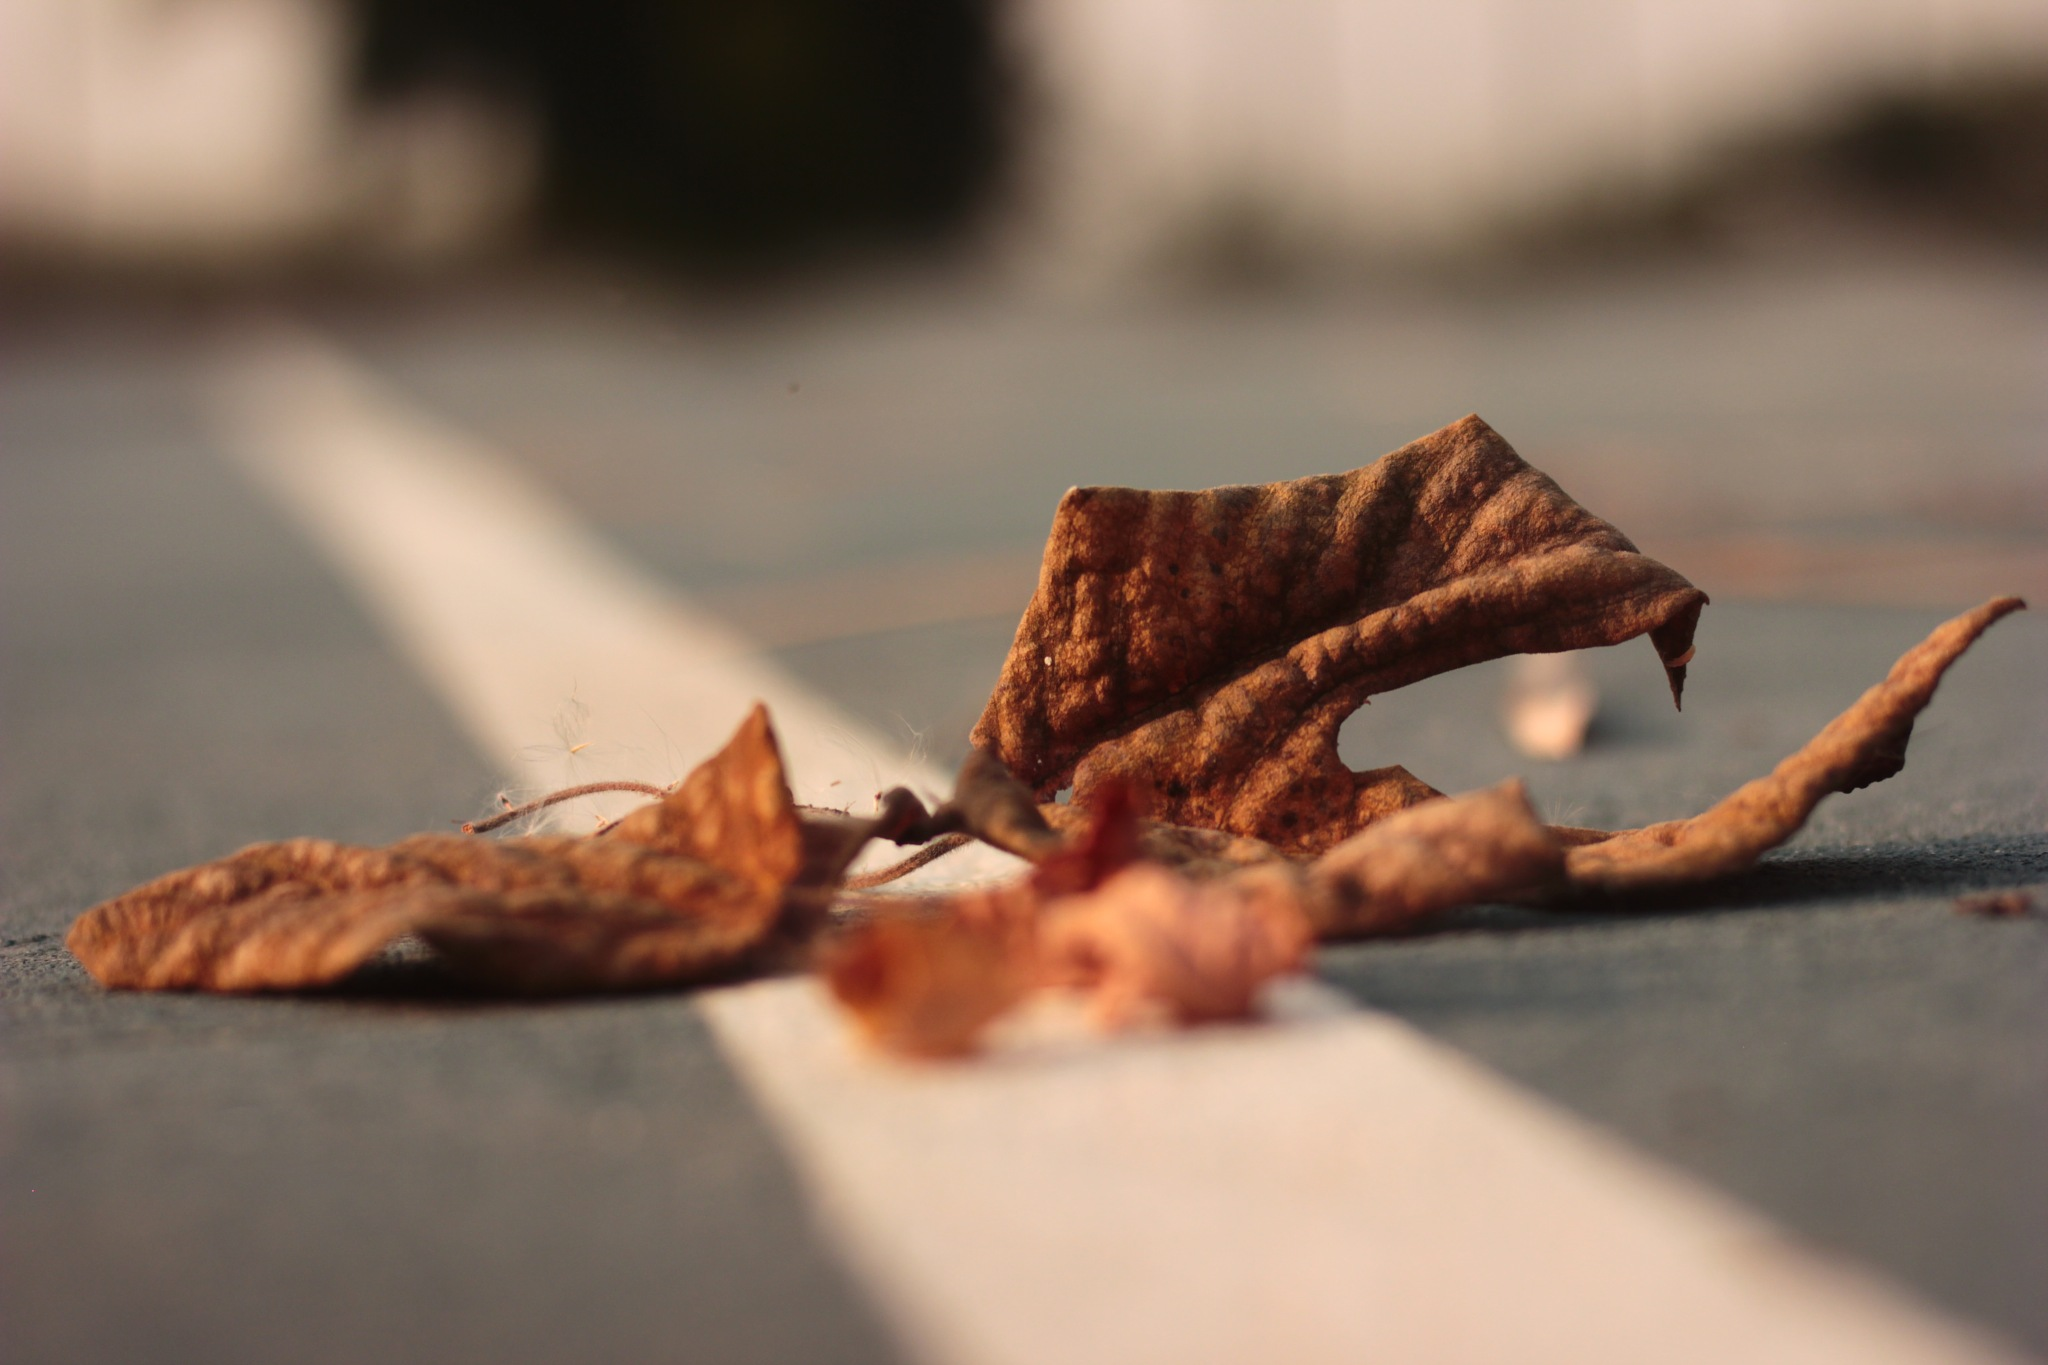 Broken life by Mehtab Hussain